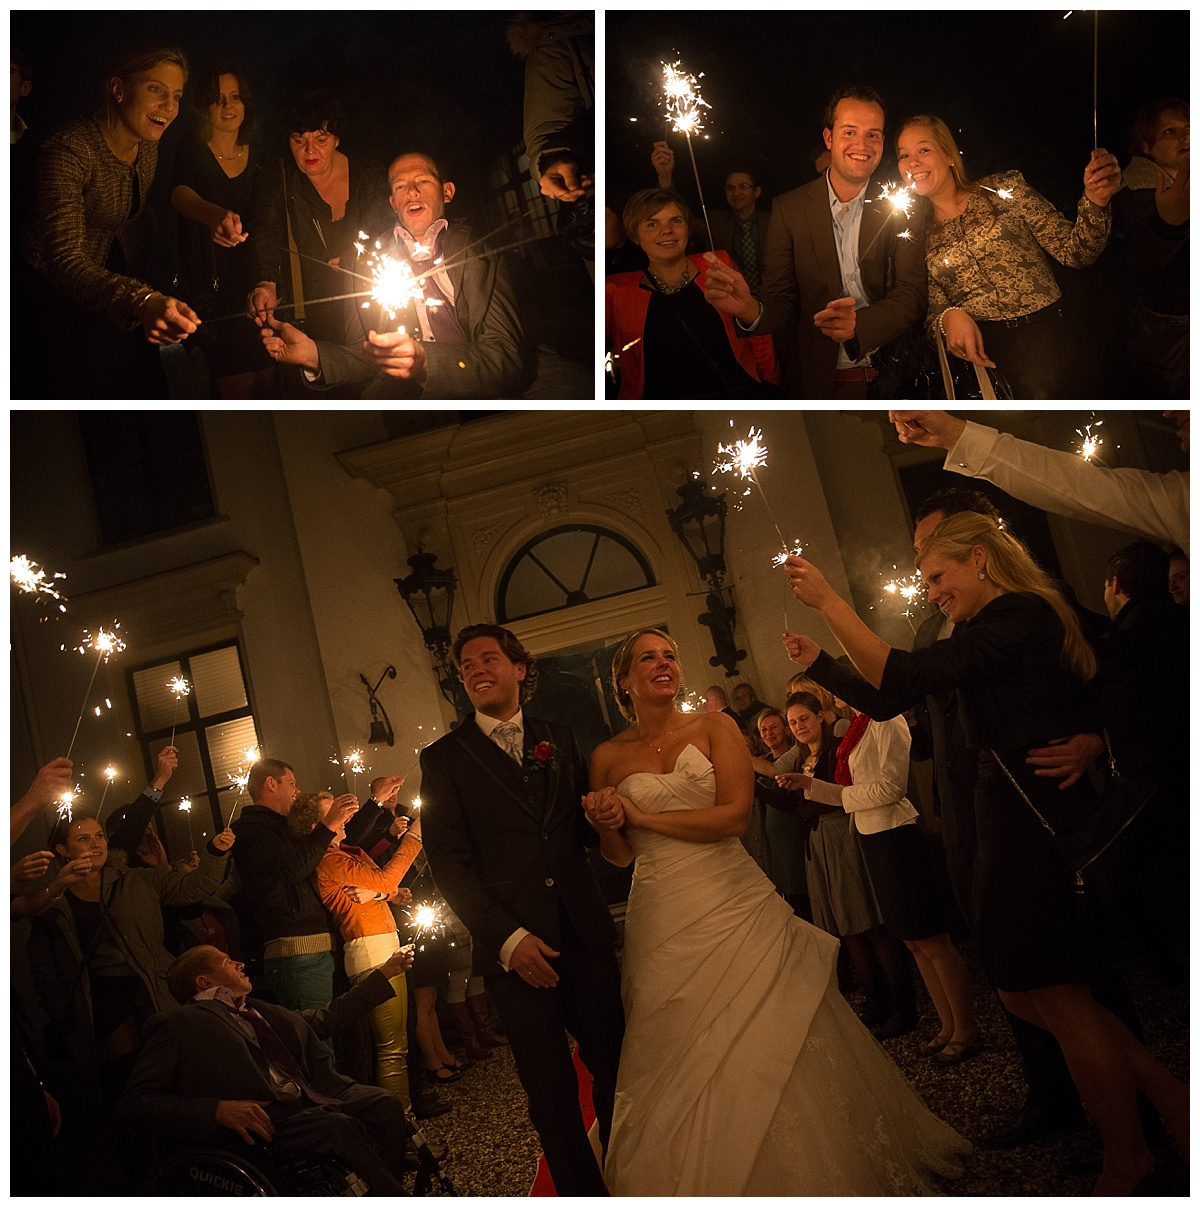 bruidsfotografie-trouwreportage-huwelijksfotografie-bruidsfotograaf-feestfotografie-Ingeborg en Martijn-52.jpg